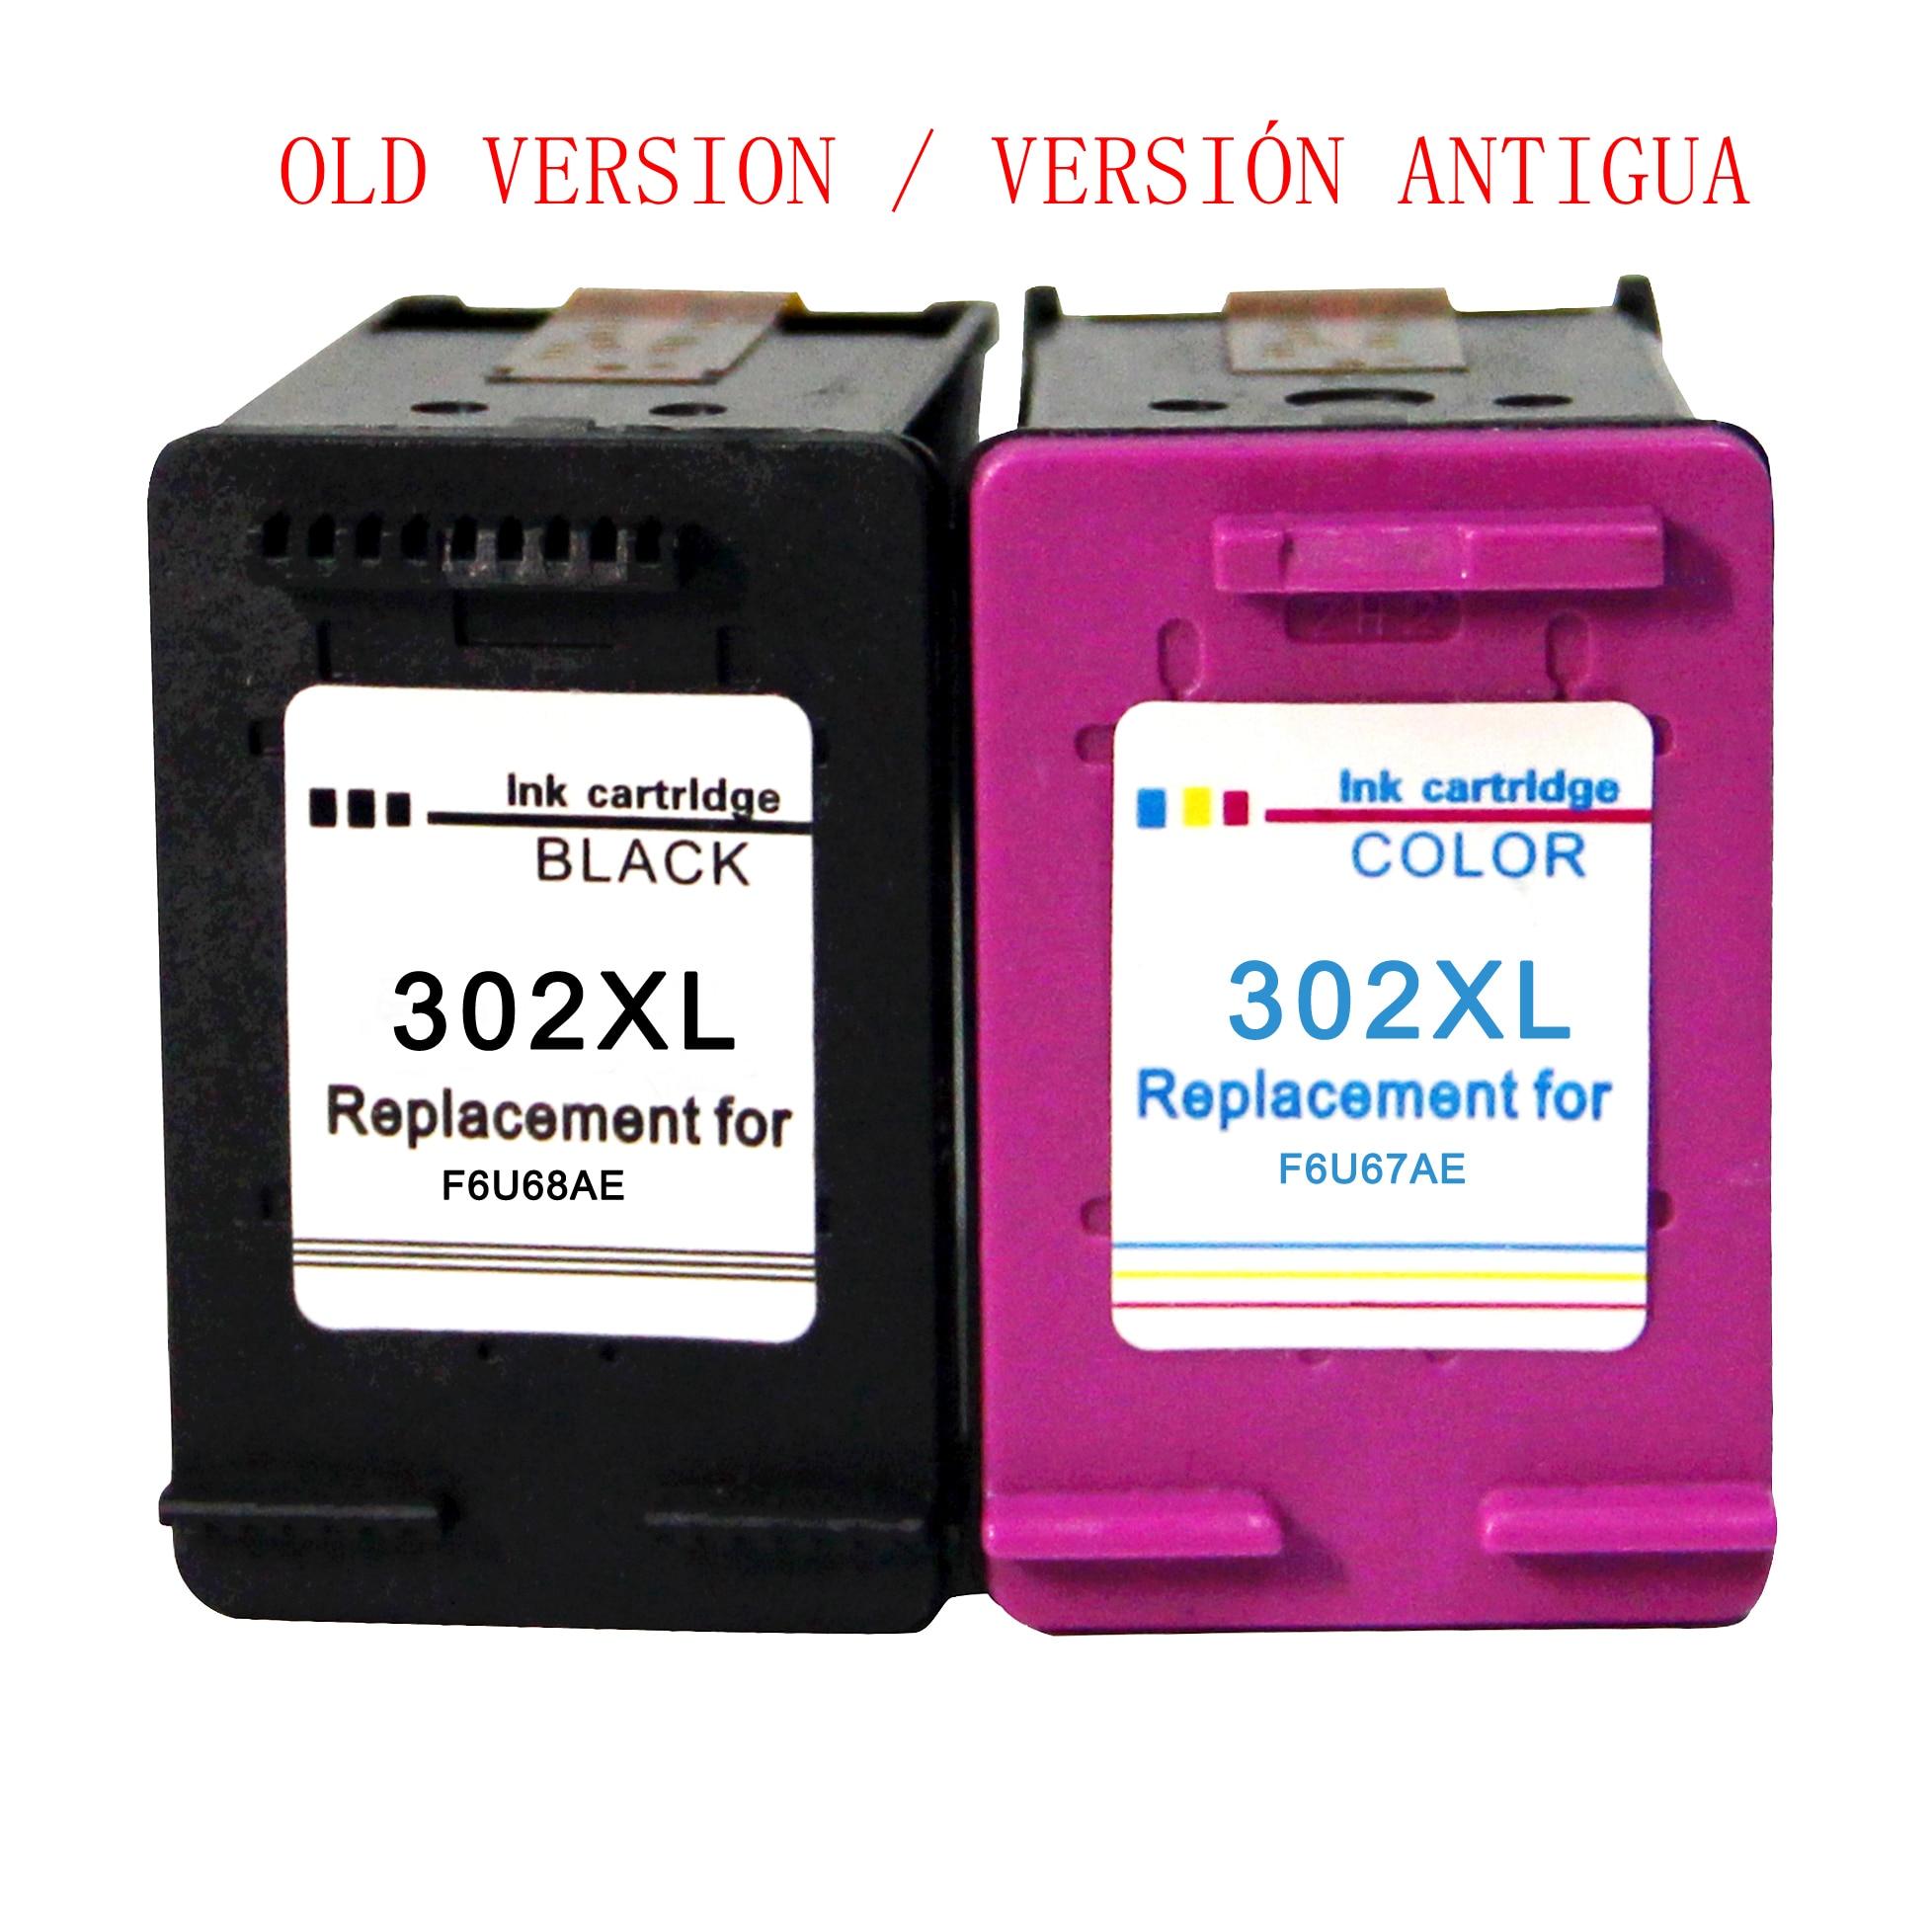 תואם HP 302 XL Cartucho דה טינטה para HP 302 XL עבור hp 302 עבור HP Deskjet 2130 2135 1110 3630 3632 Officejet 3830 3834 4650